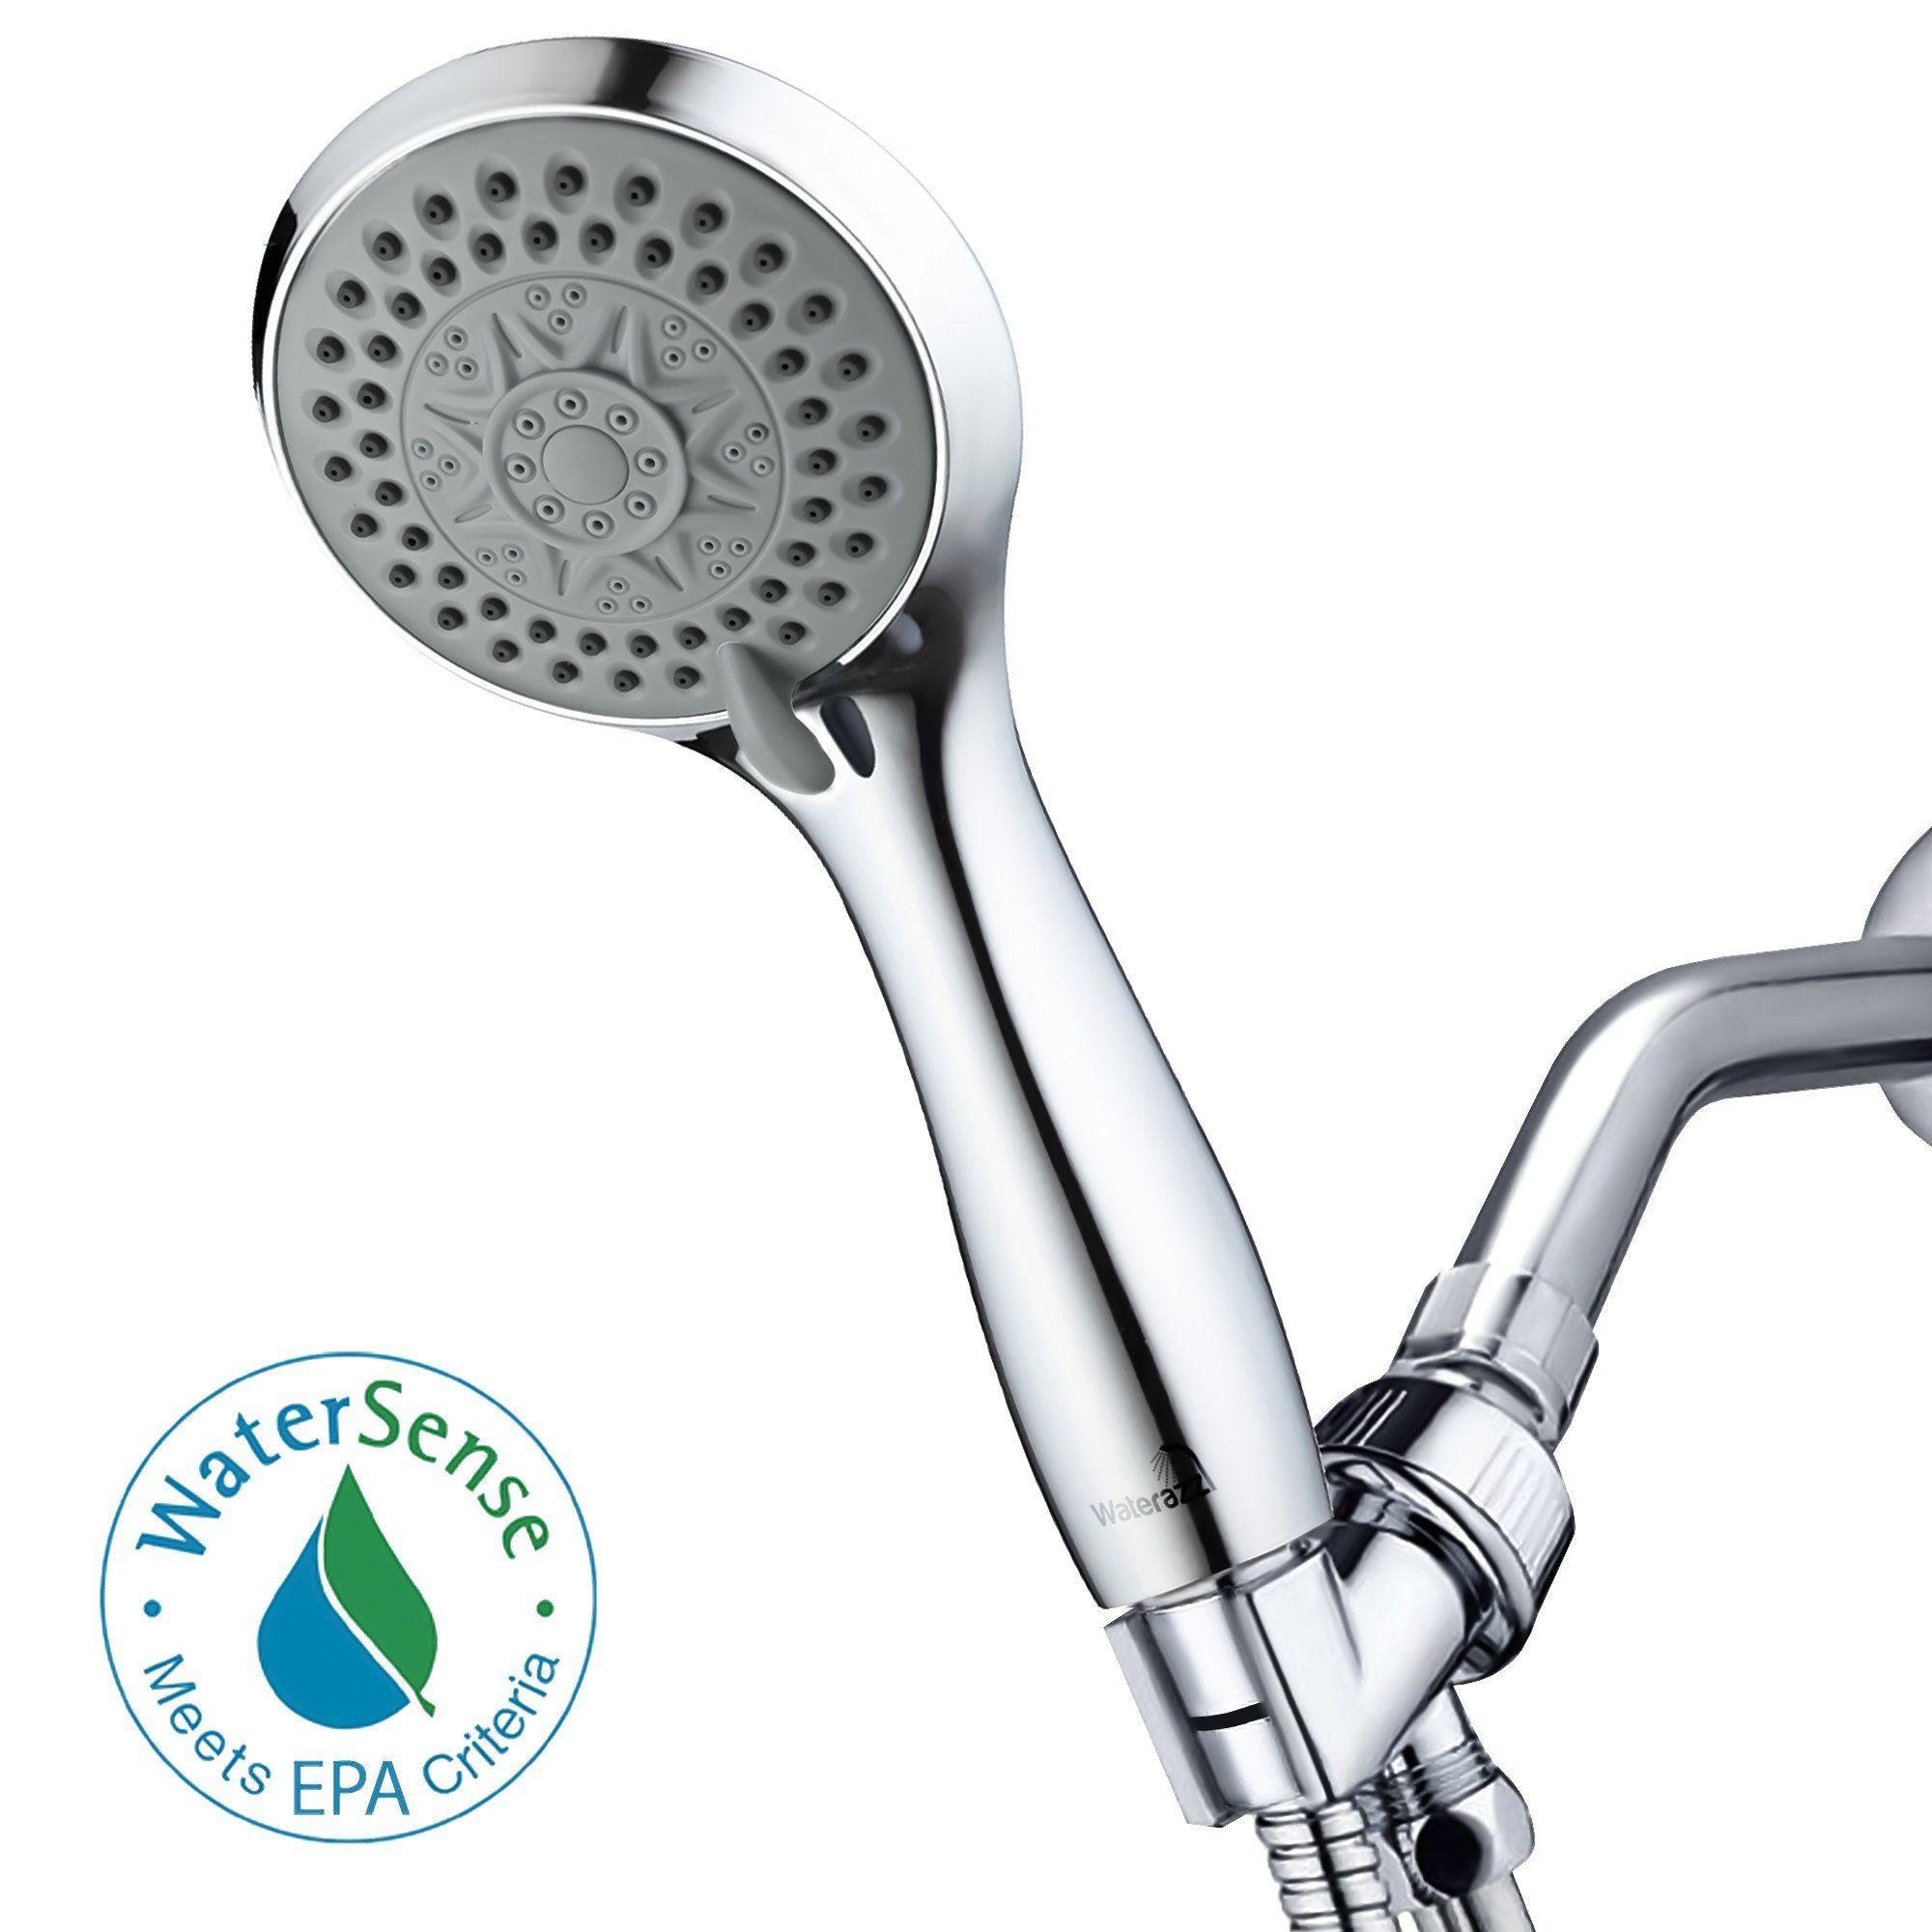 High Pressure Handheld Shower Head - Luxury Hand Showerhead with ...